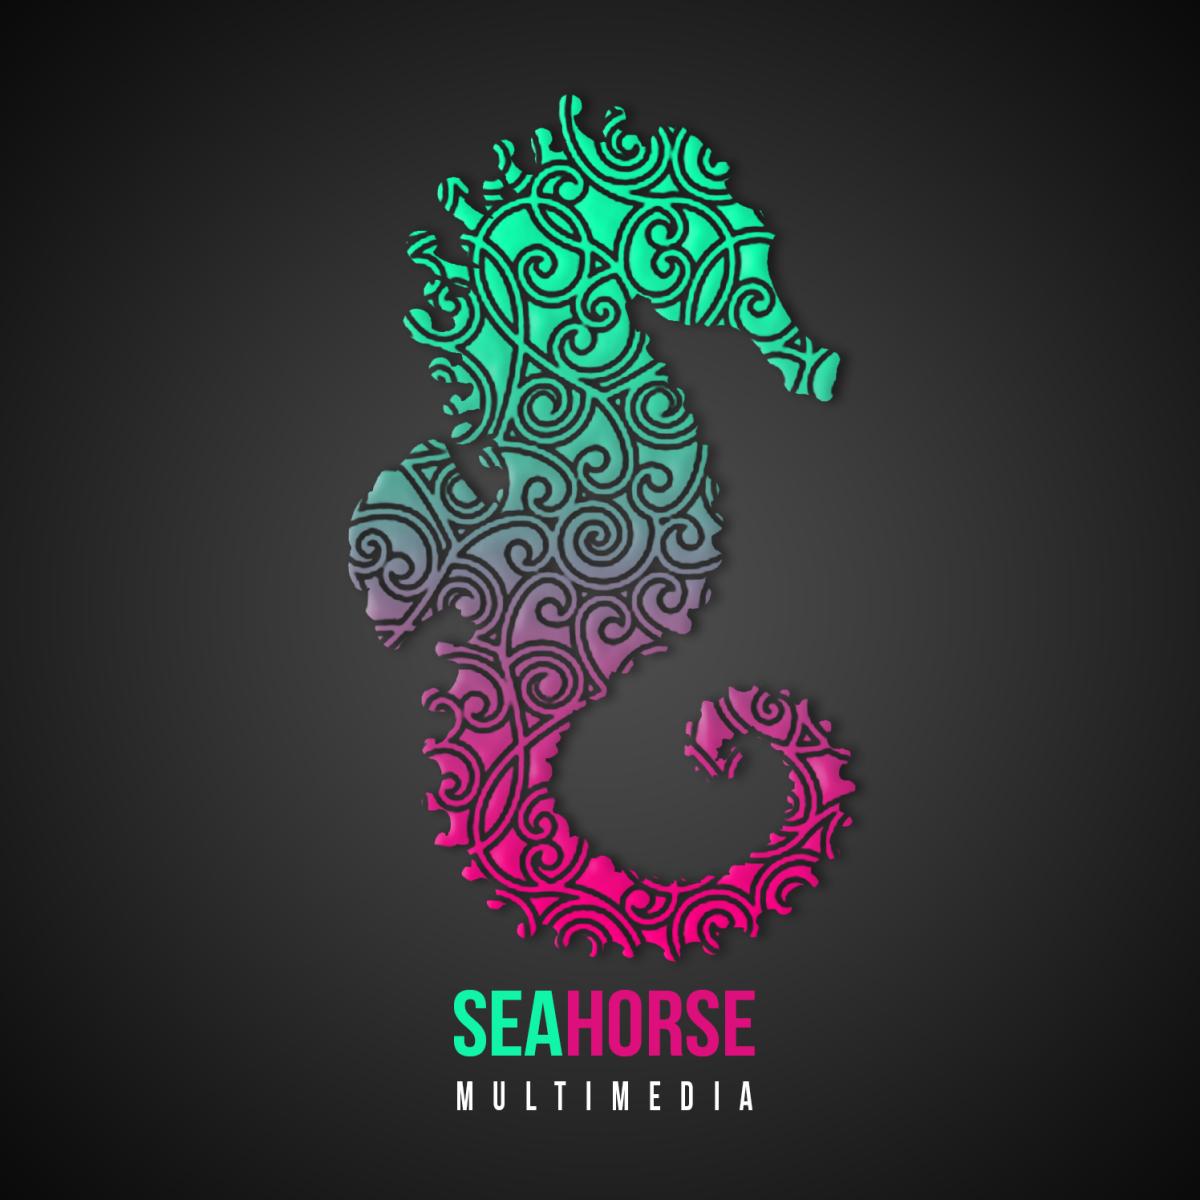 Sea Horse Multimedia